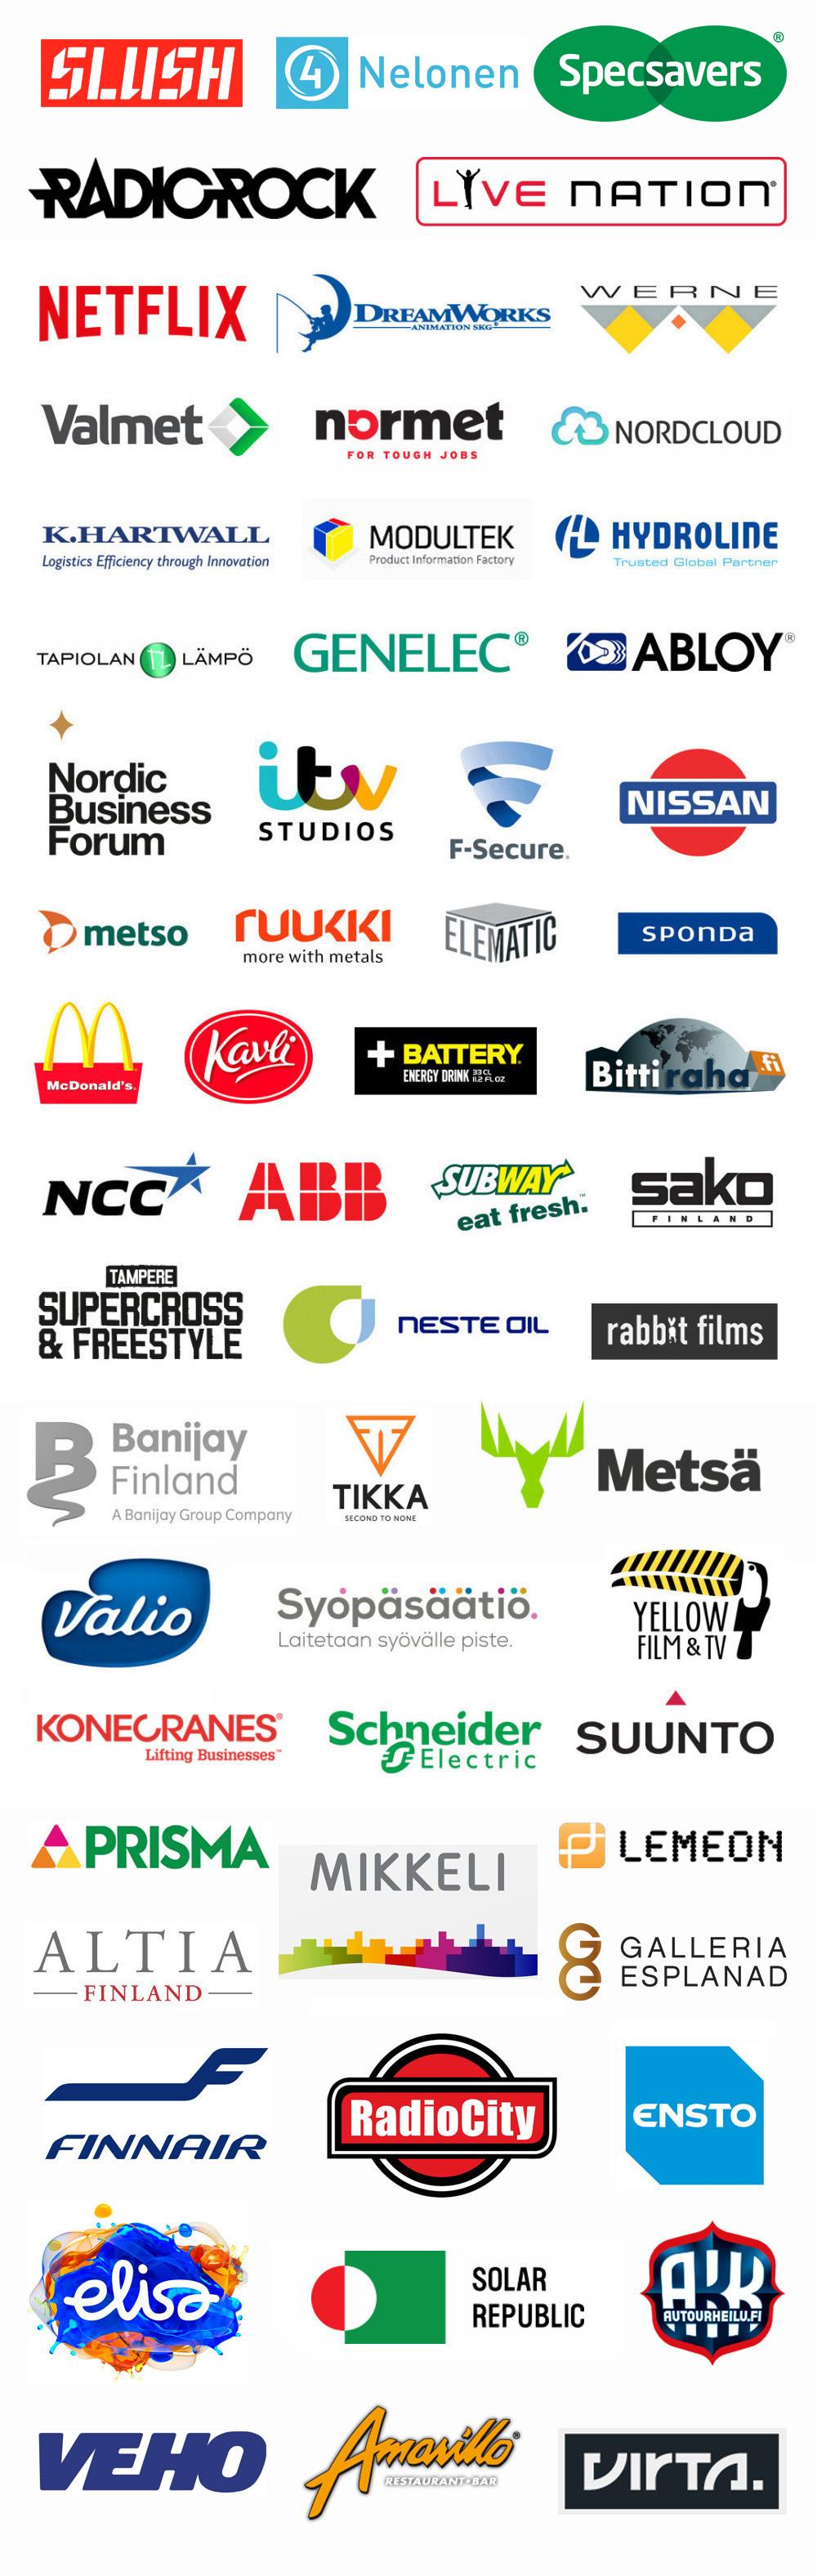 michael-majalahti-client-logos-collage